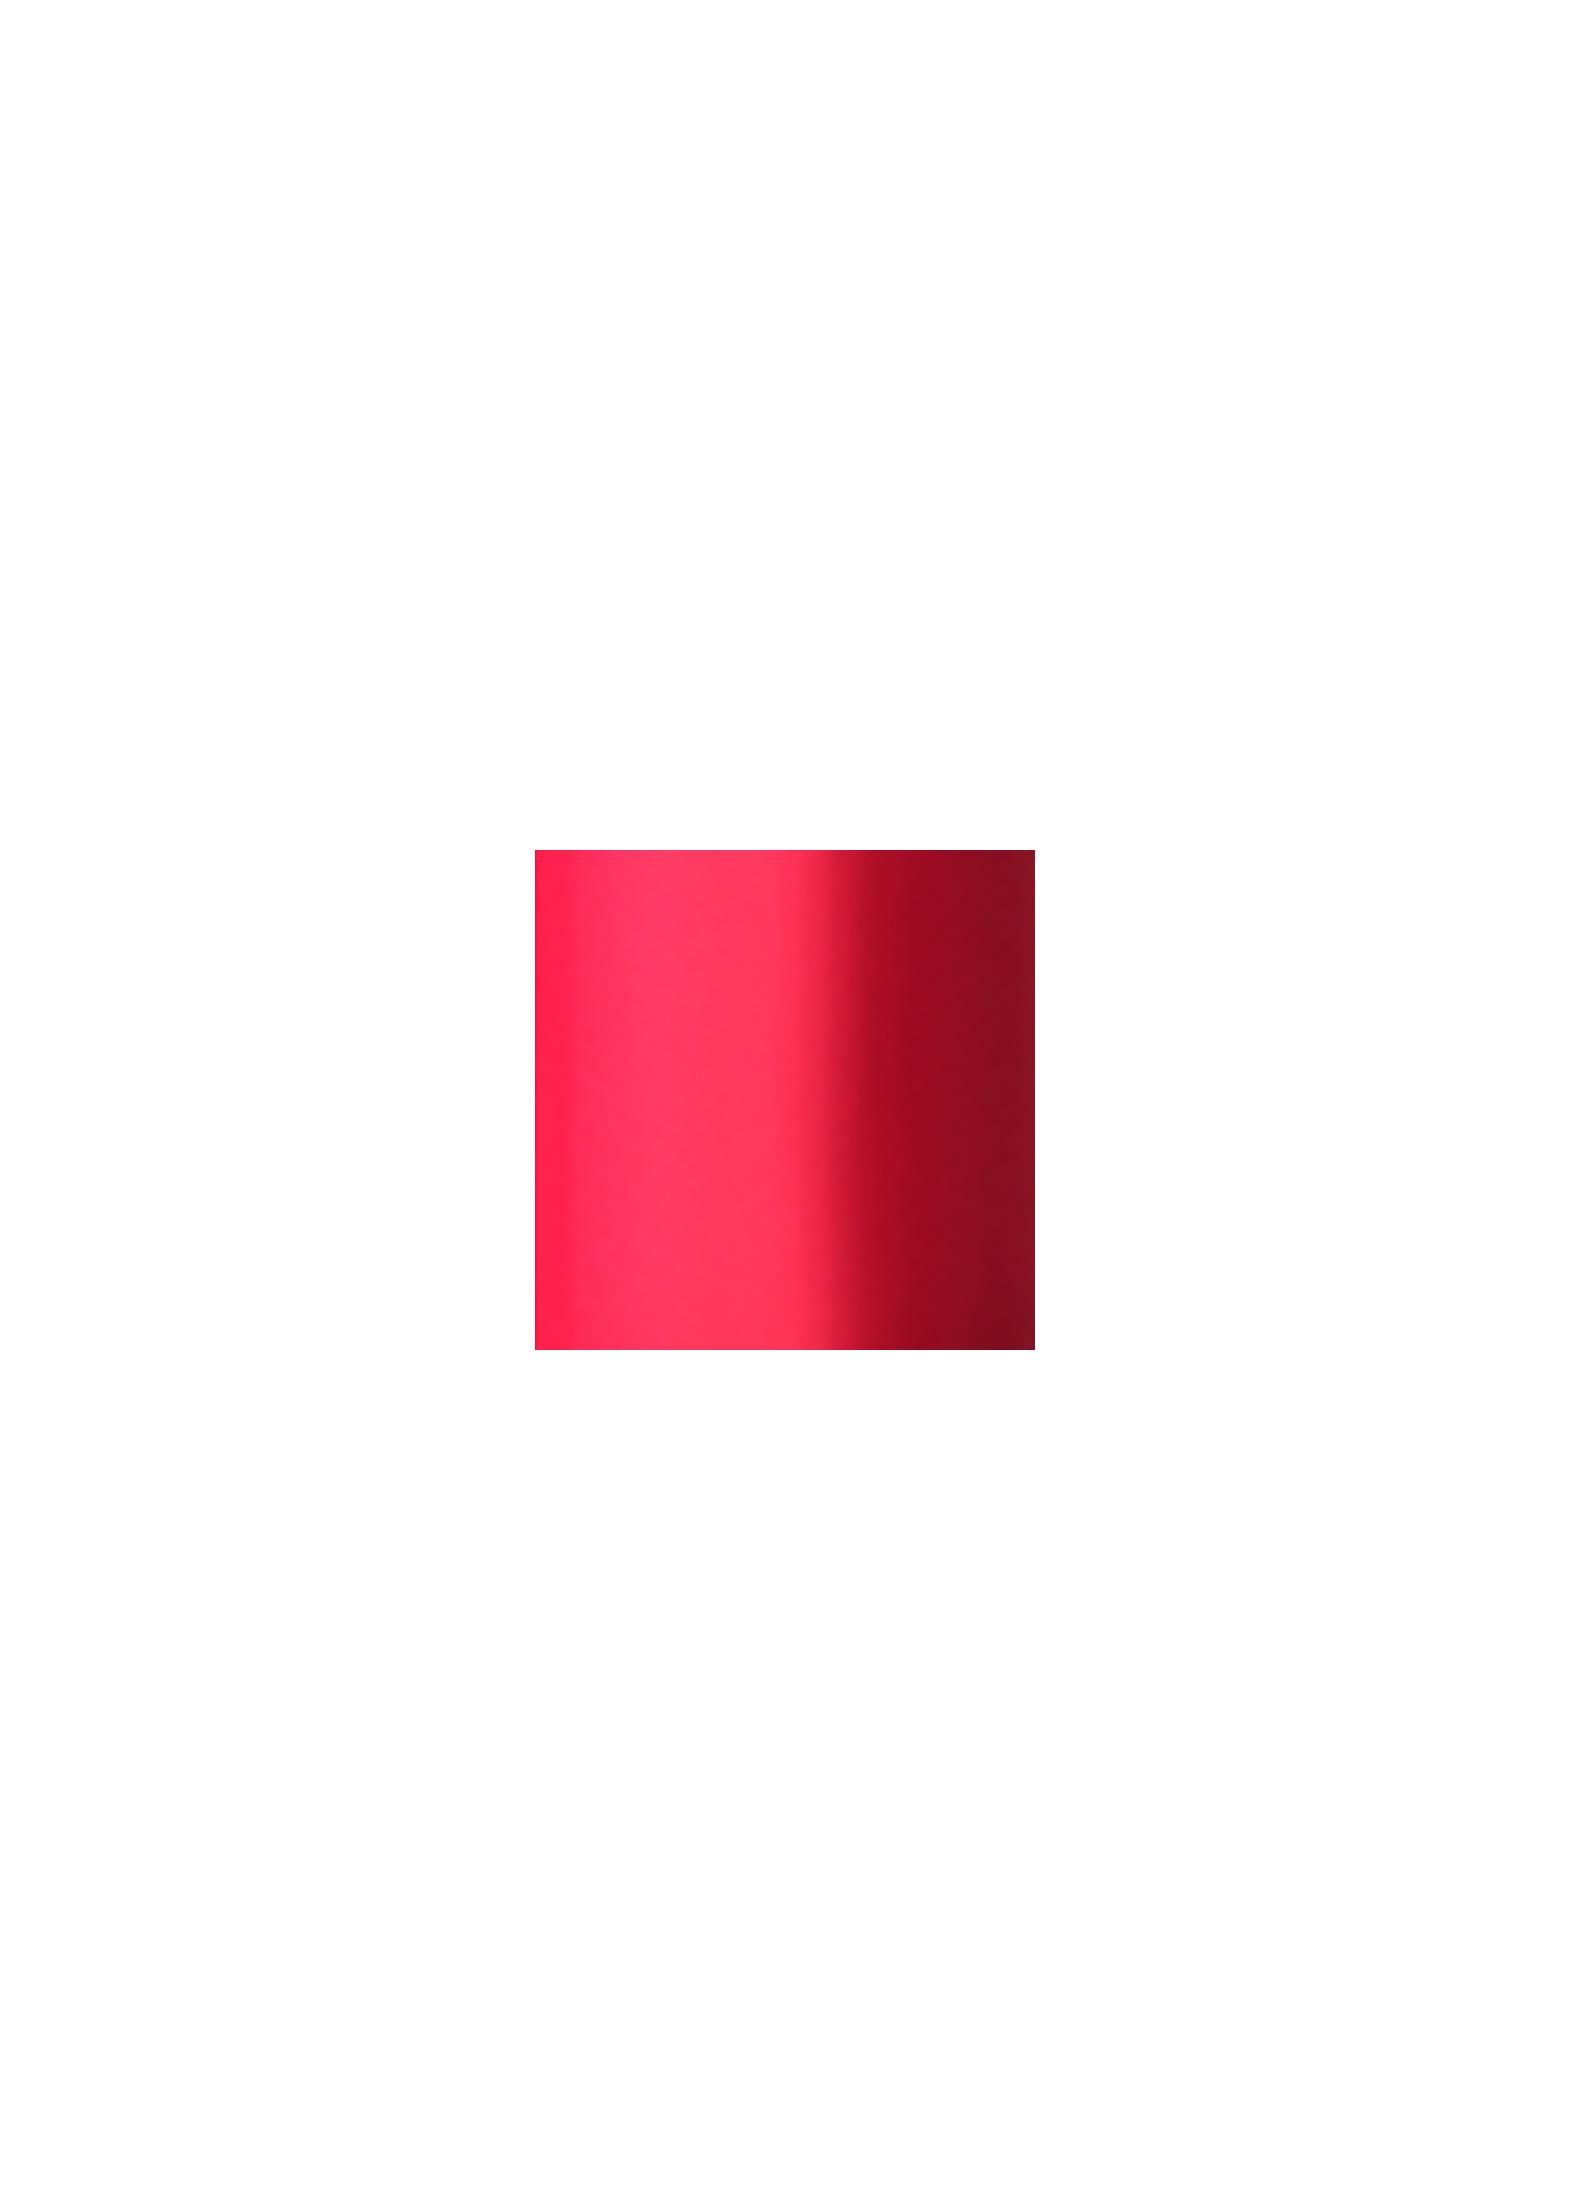 LIPSTICK-DRAMARAMA 3GM/.1OZ image number 3